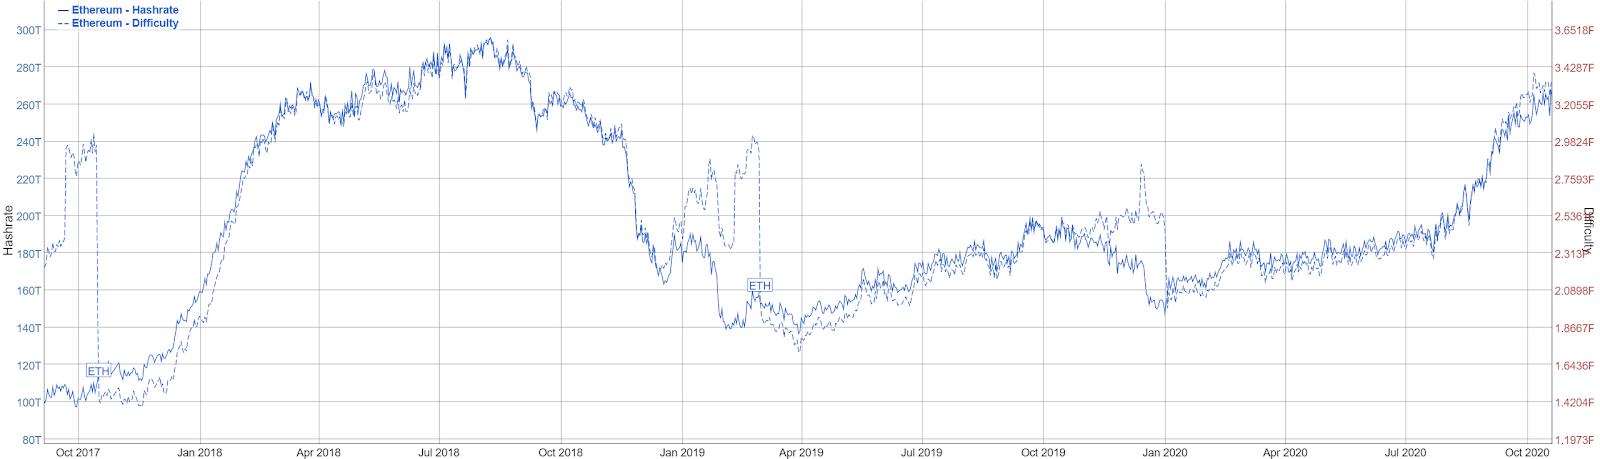 Ethereum Price Analysis 22 Oct 2020 (6)